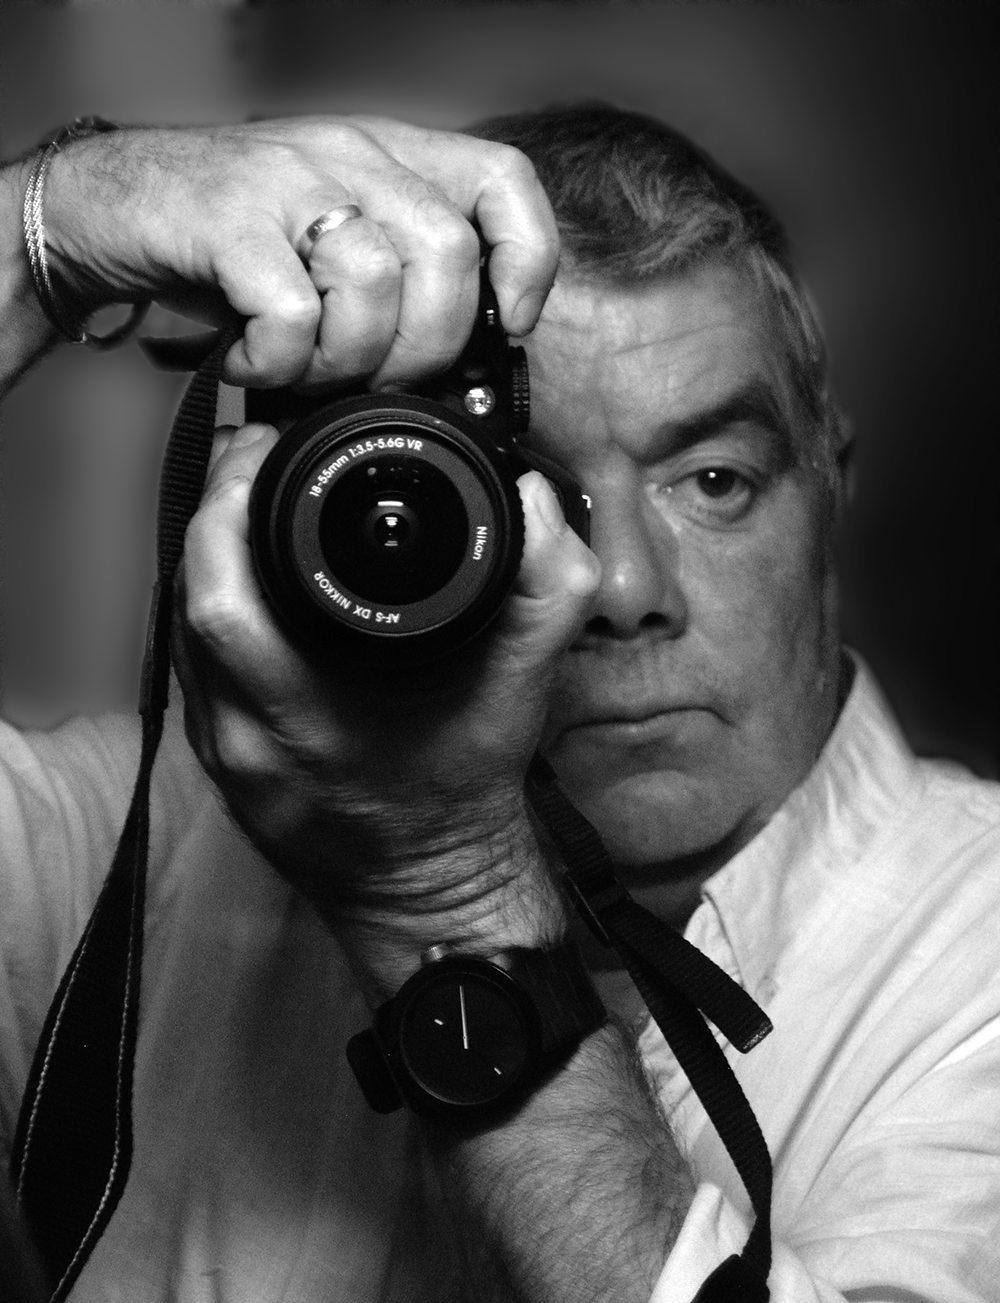 Jean-Philippe Hemery